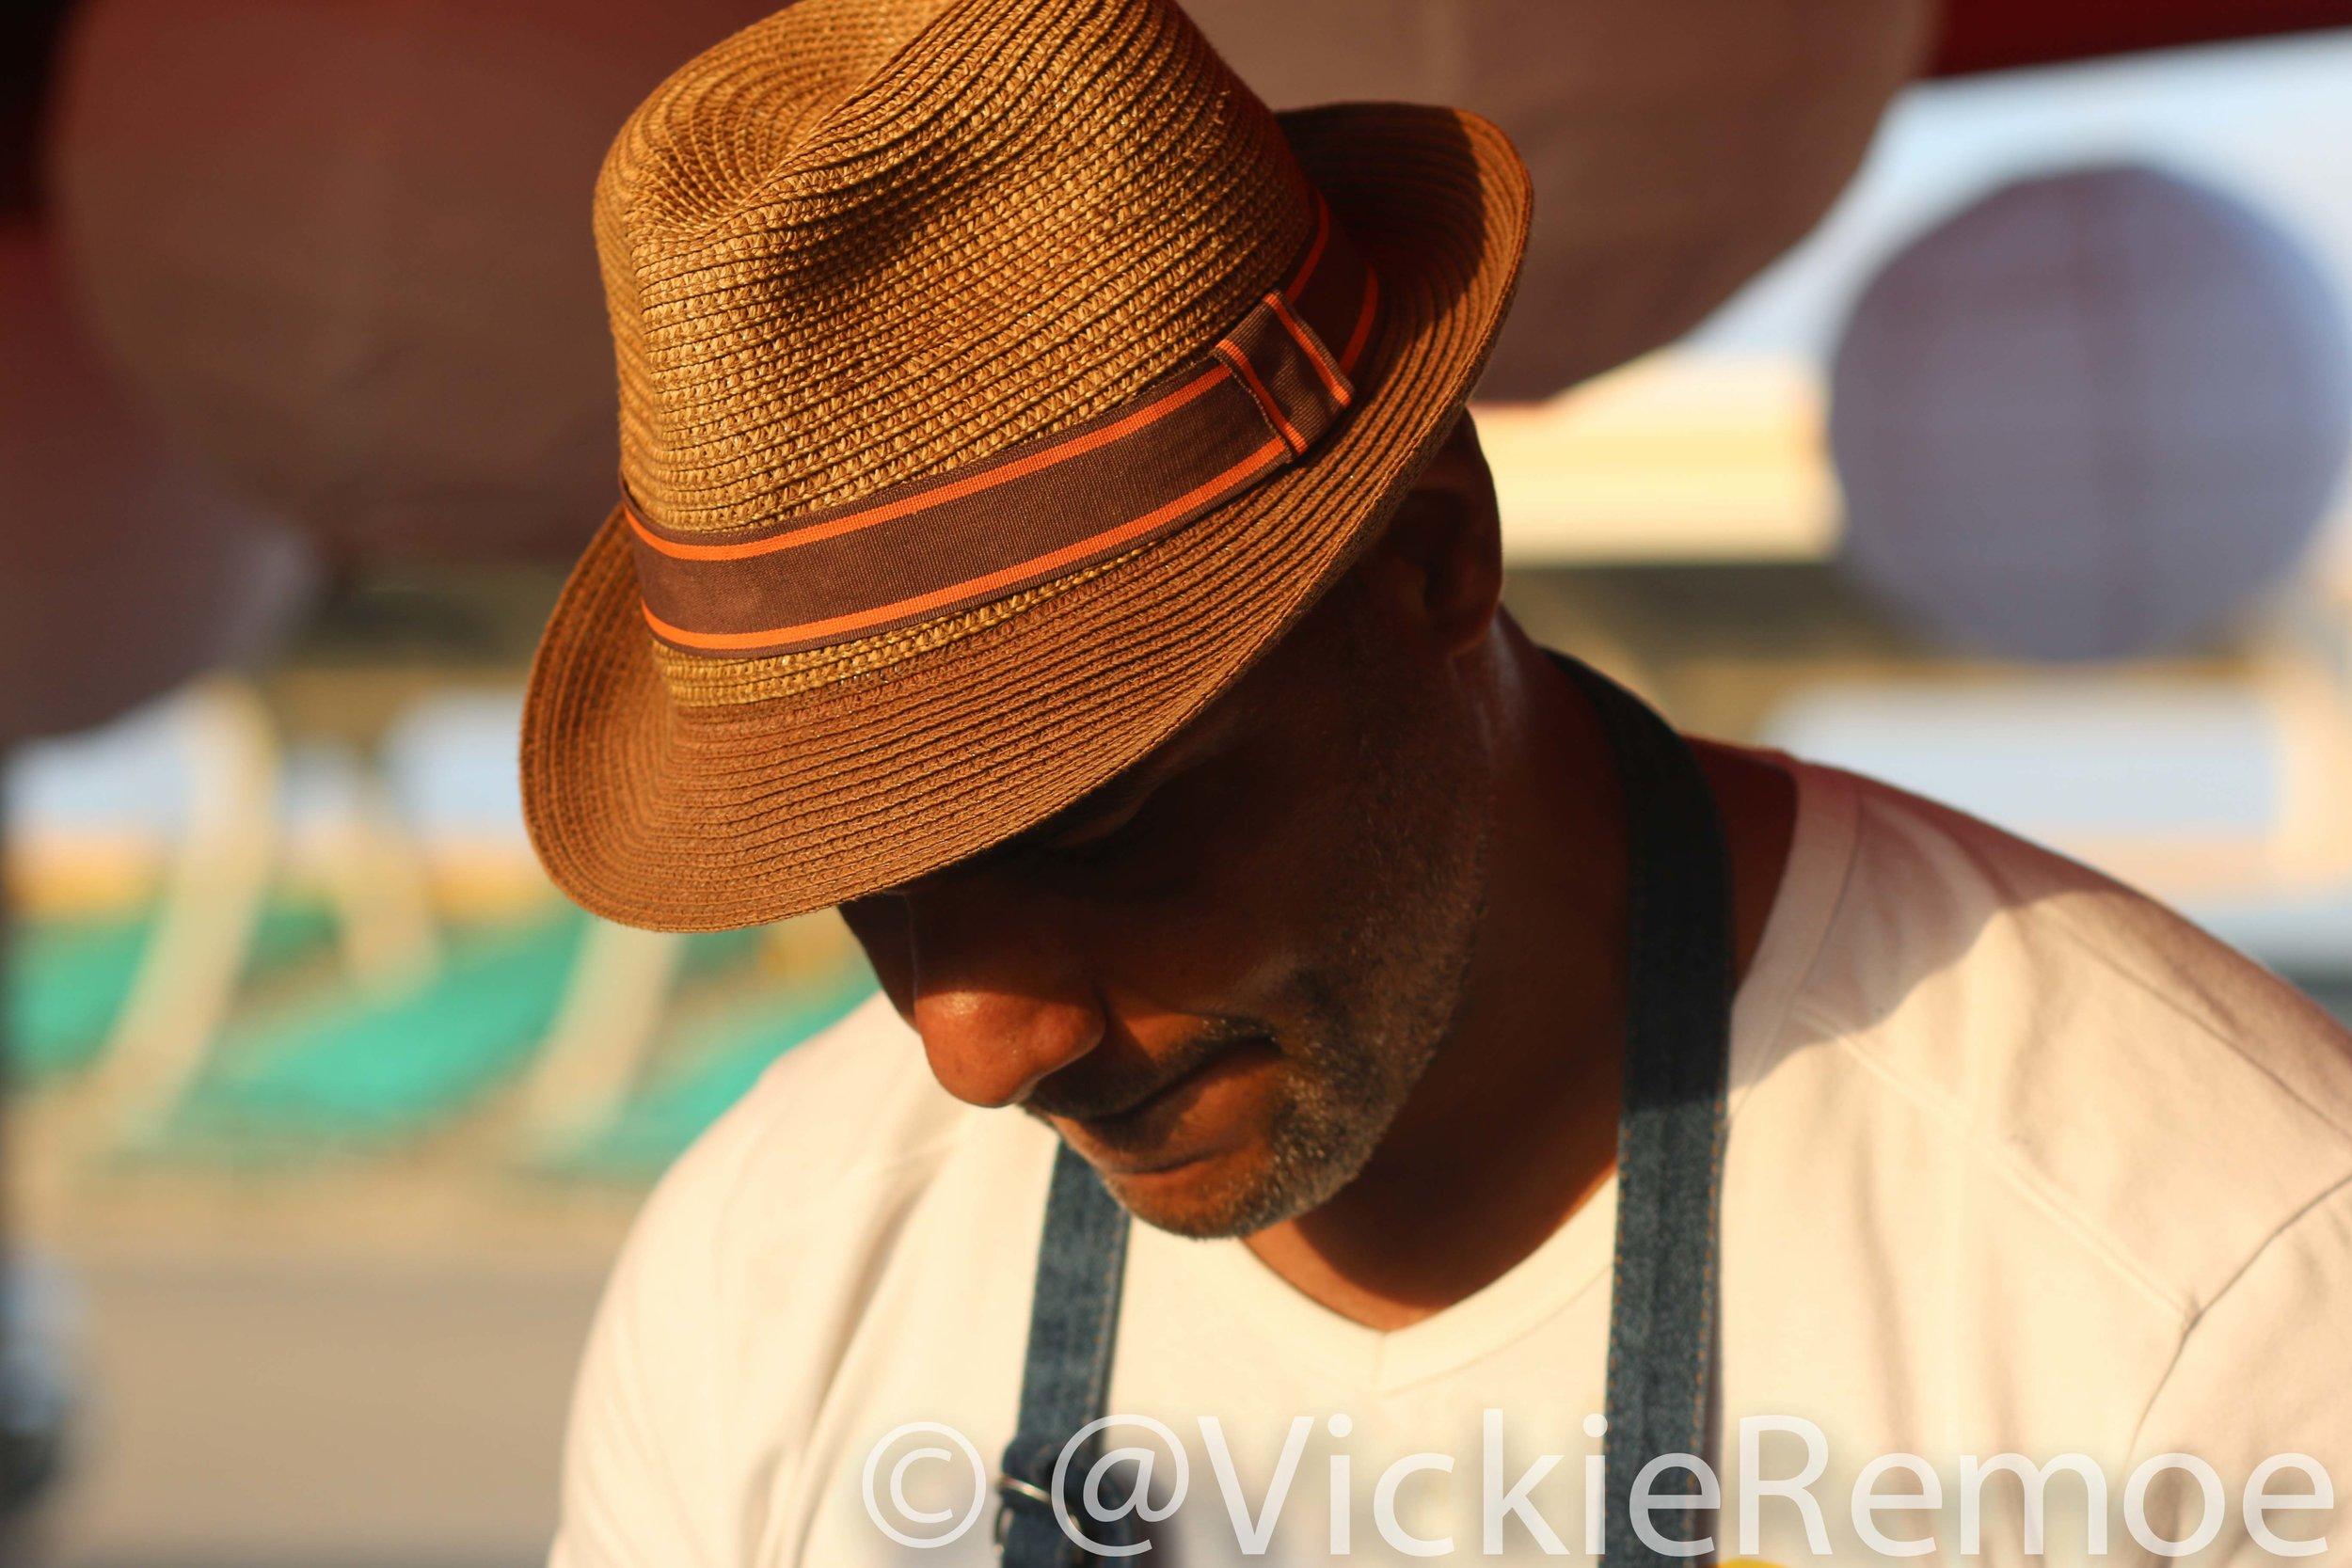 AccraFoodFestival-VickieRemoeBlog-Ghana11.jpg